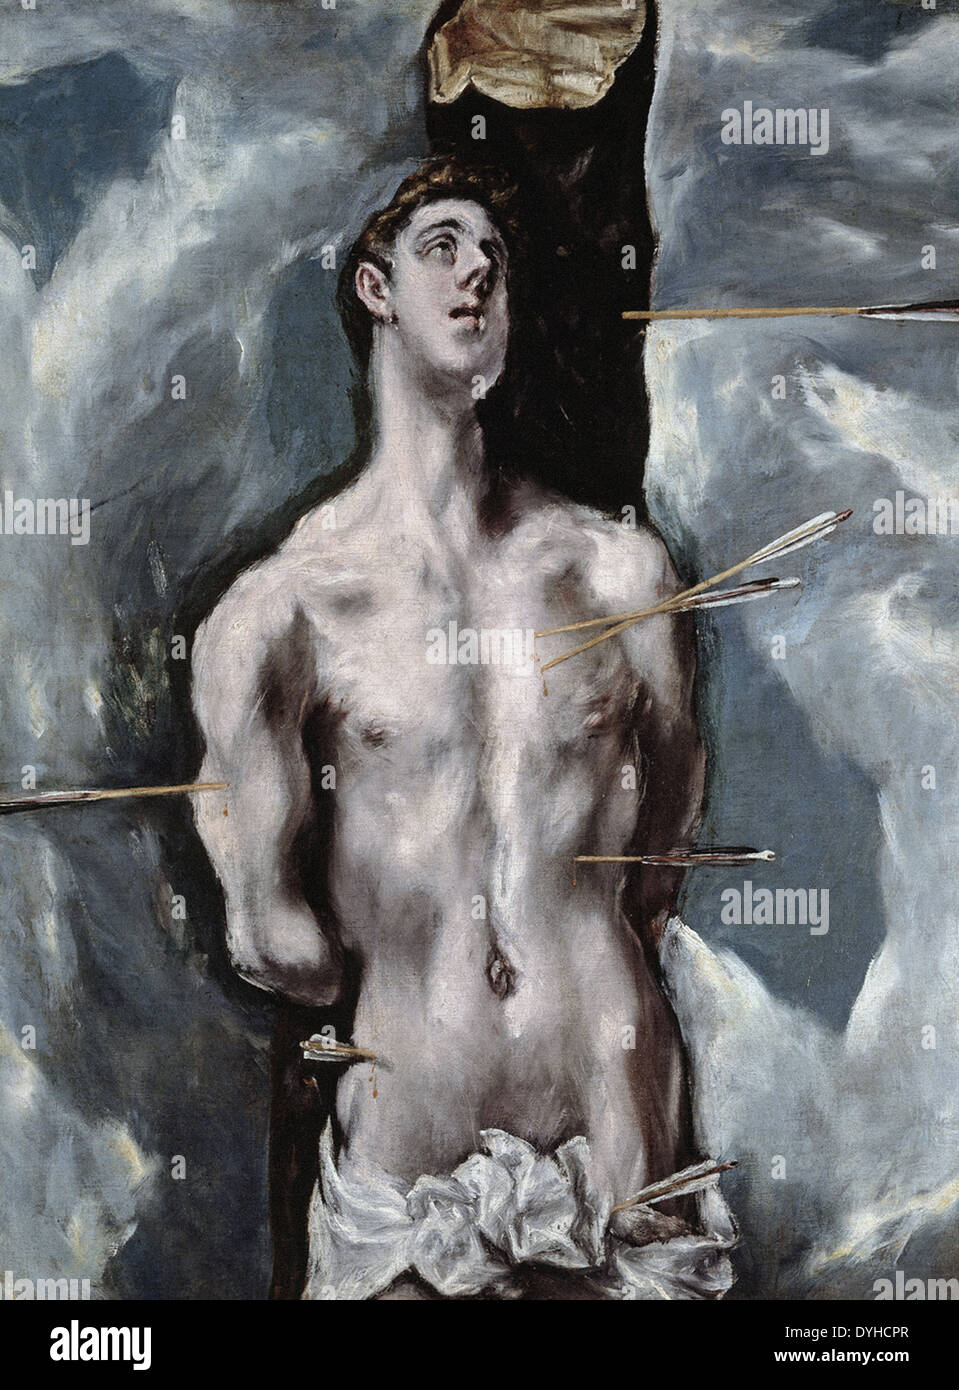 El Greco Saint Sebastian - Stock Image